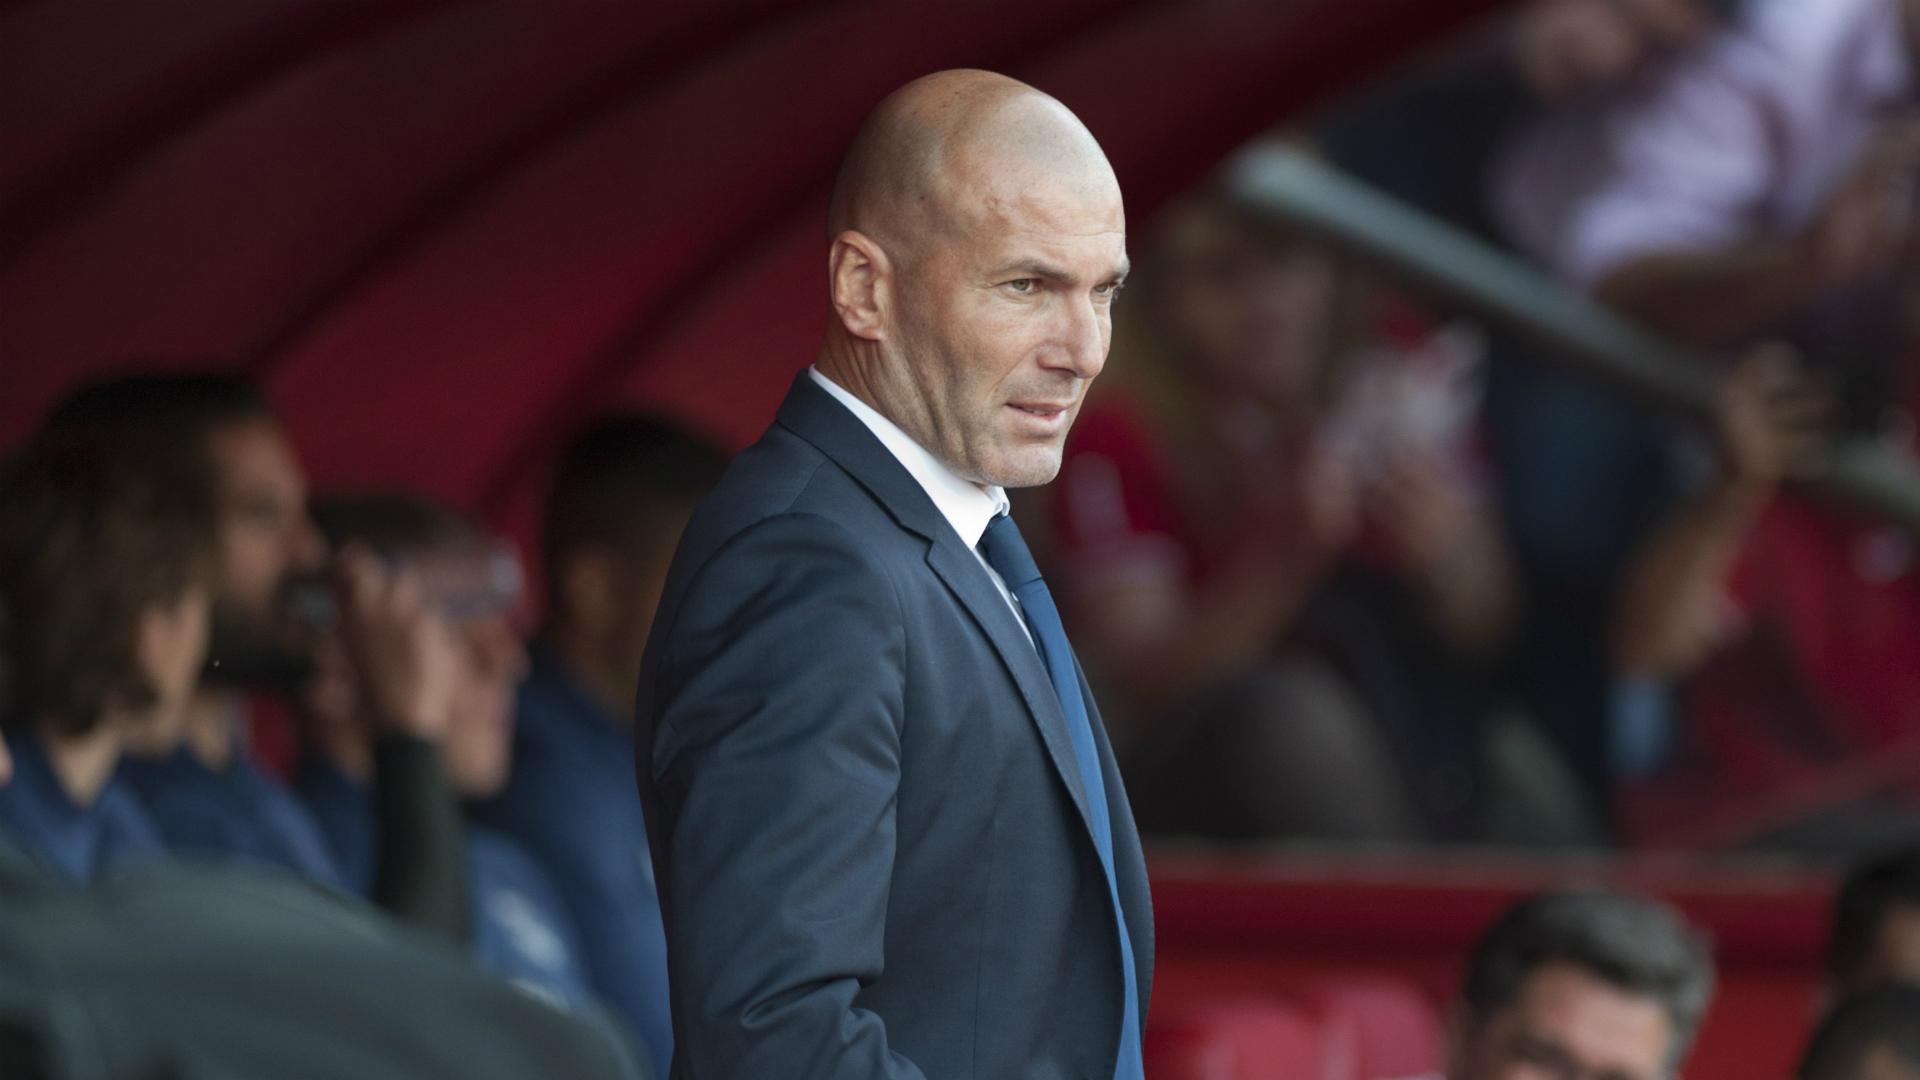 Spain la liga table standing 2016 2017 - Zinedine Zidane Real Madrid Granada Laliga 06052017